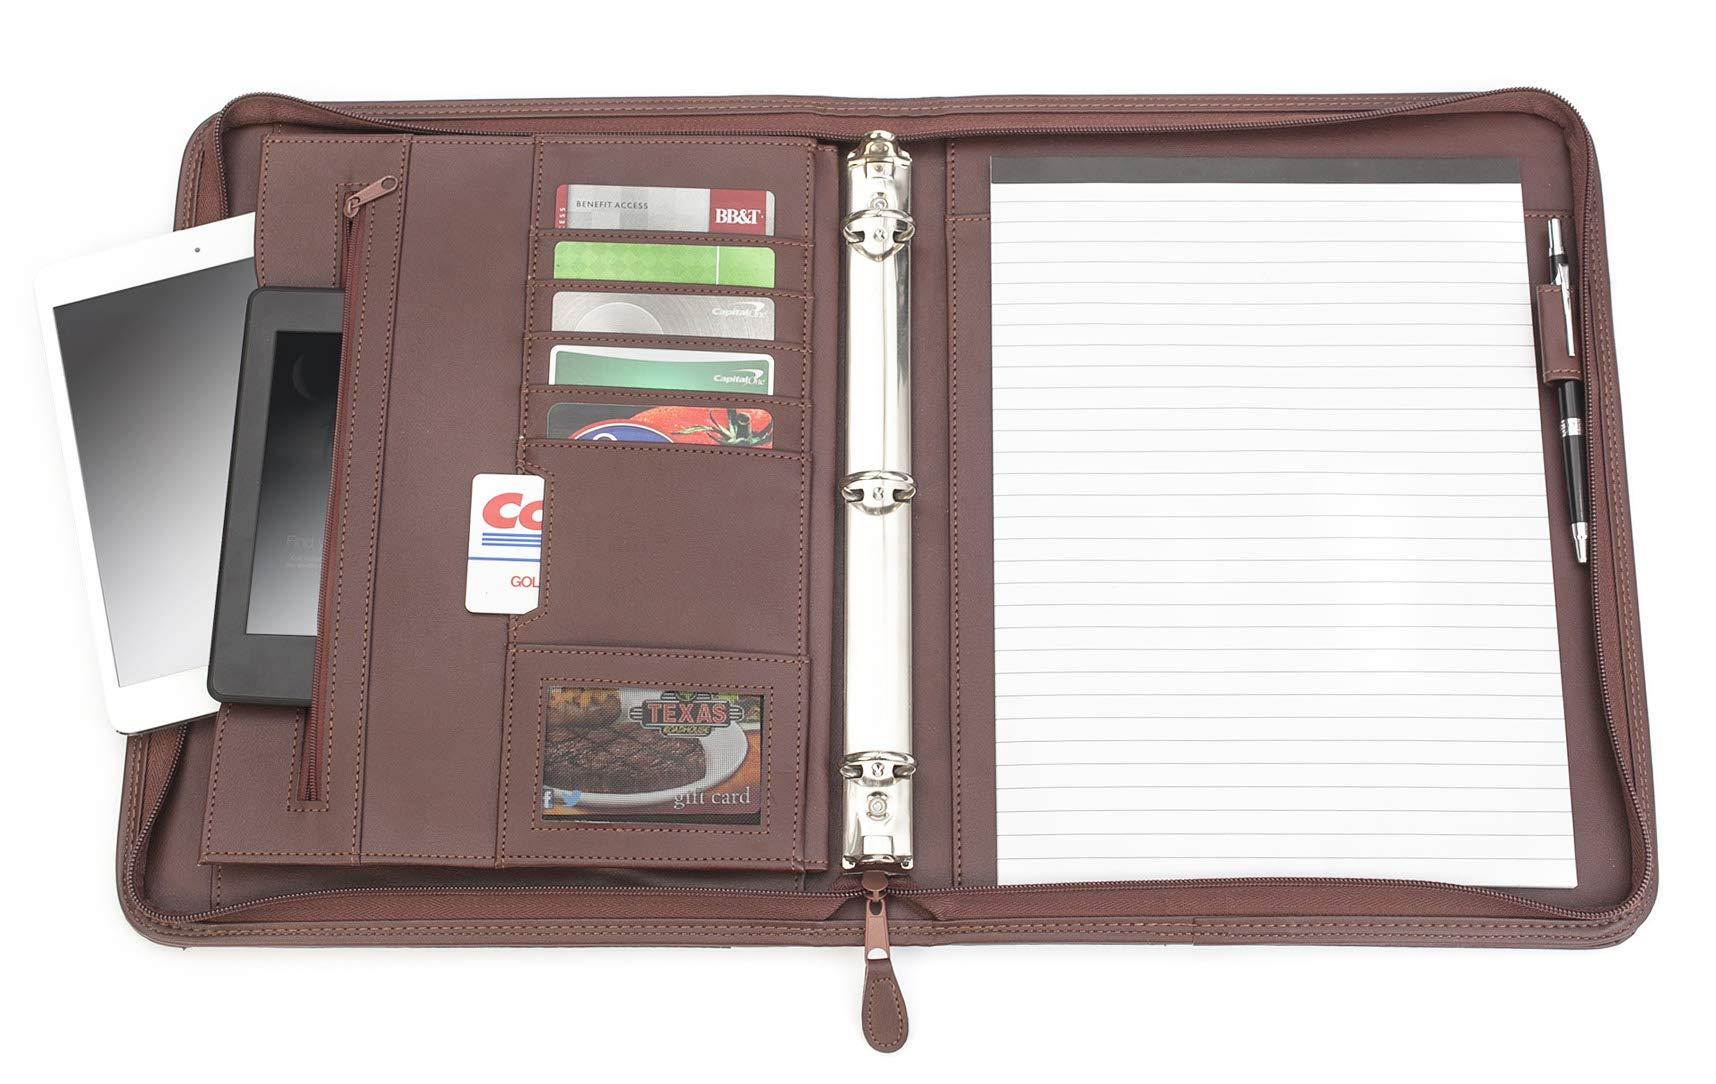 Professional Executive PU Leather Business Resume Portfolio Padfolio Case Organizer with iPad Mini or Tablet Sleeve Holder, Zippered Binder, Paper Pad, Card Holders, Document Folder - Black